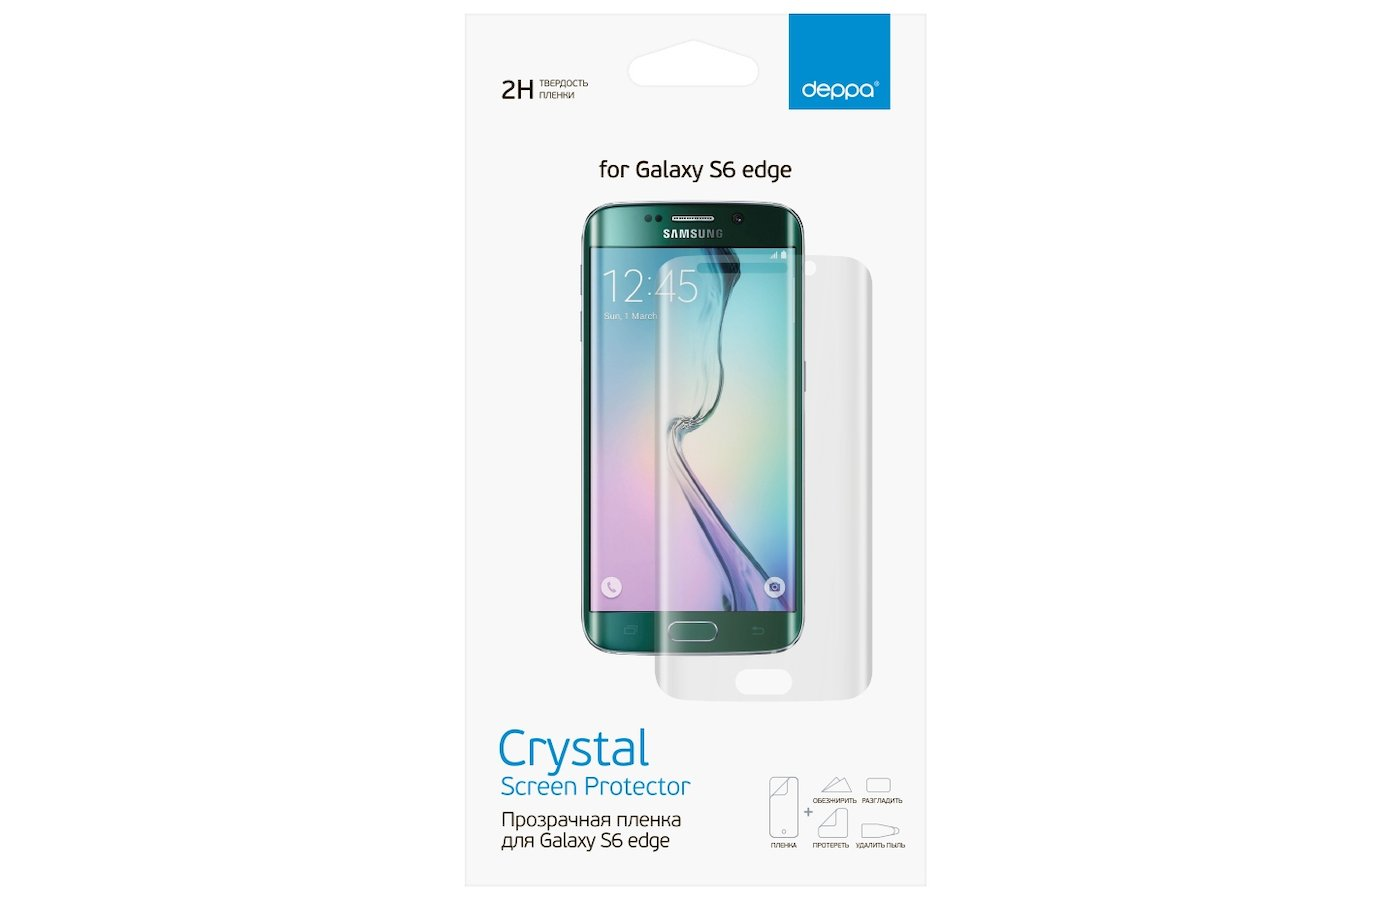 Стекло Deppa пленка для Samsung Galaxy S6 Edge (SM-G925) формованная прозрачная